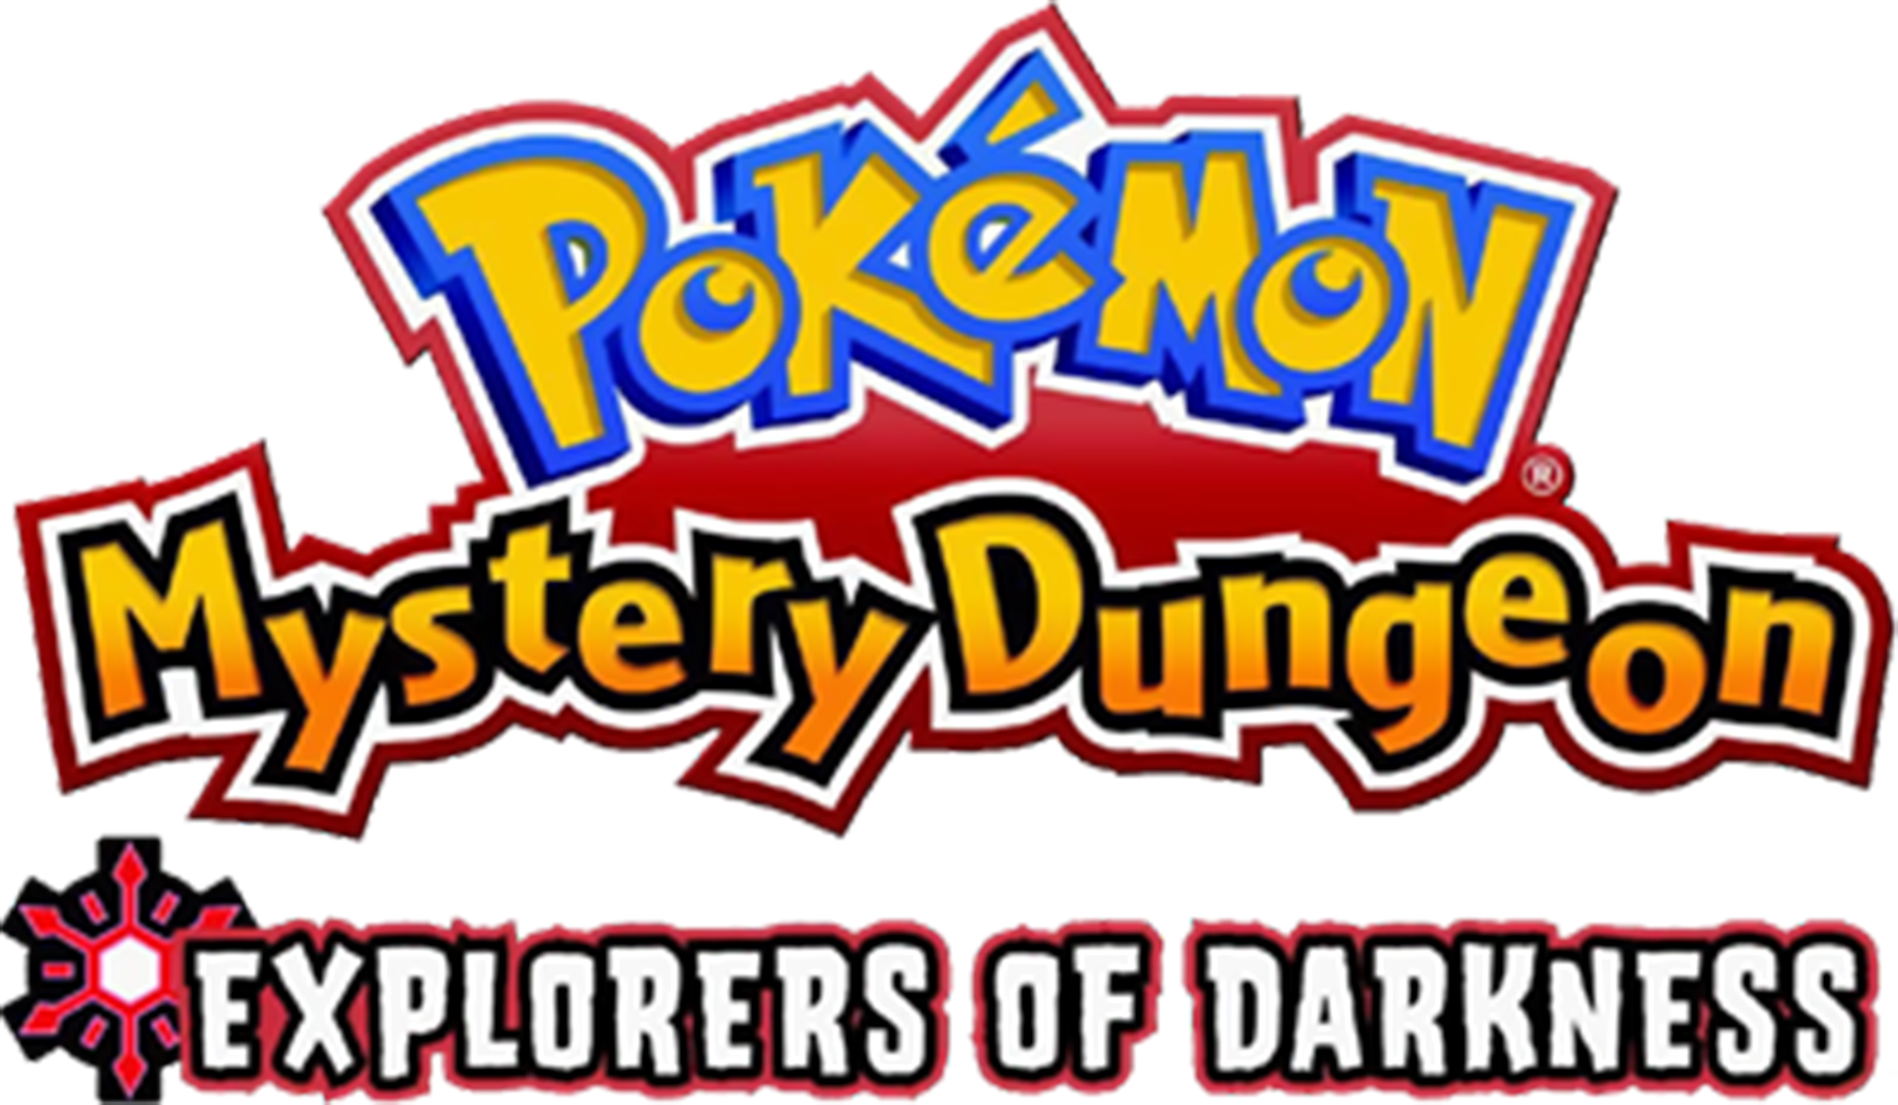 Pokémon Mystery Dungeon Explorers of Darkness